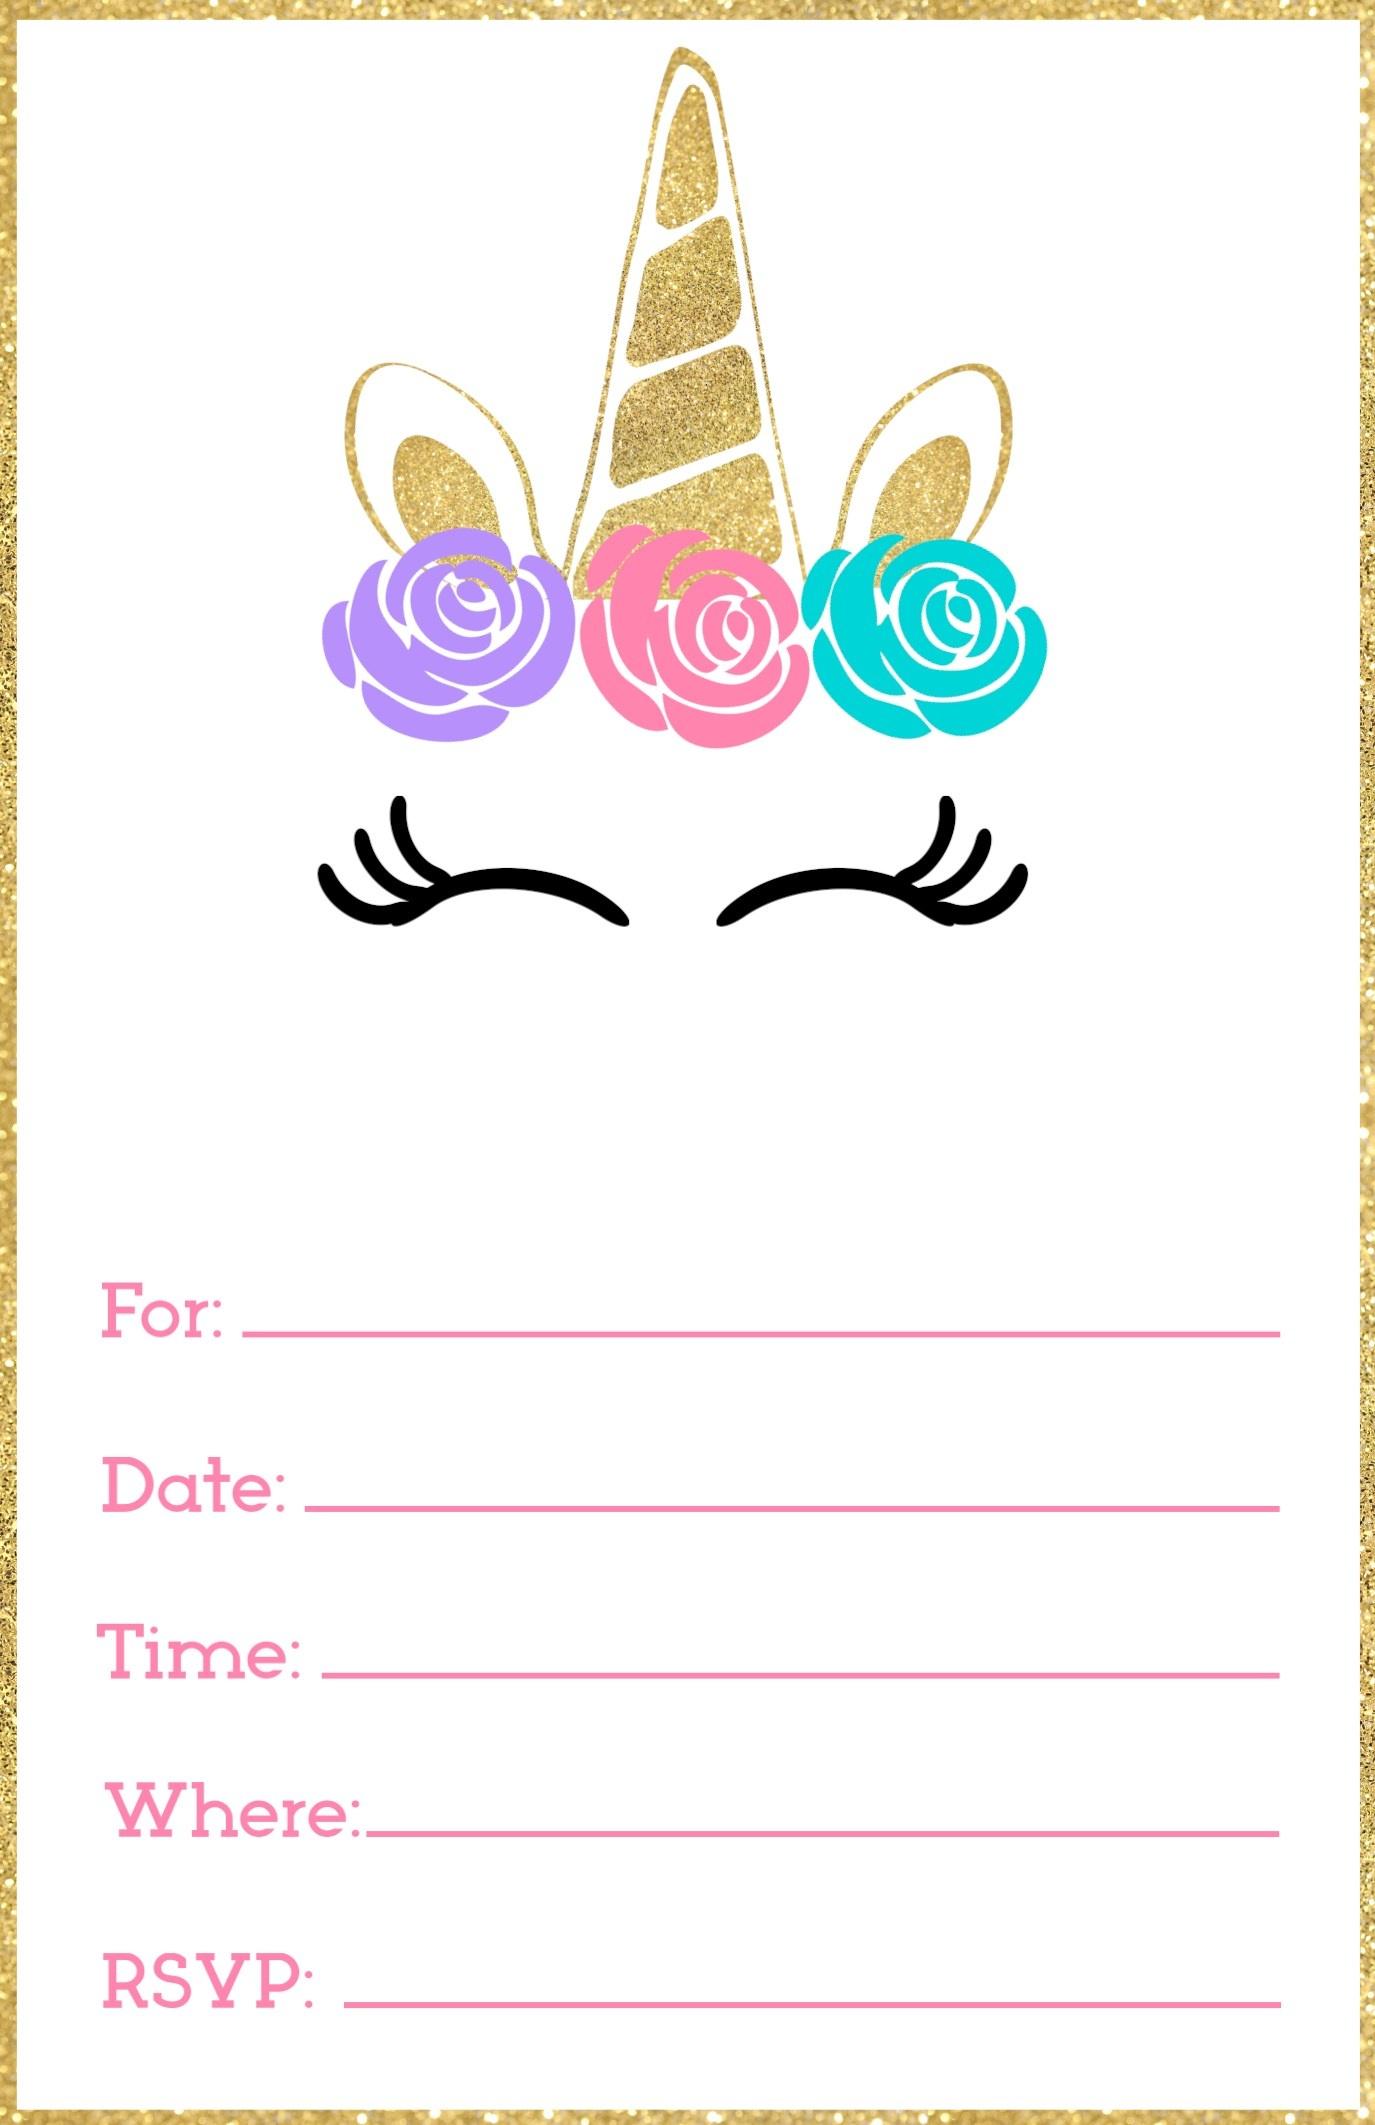 Free Printable Unicorn Invitations Template - Paper Trail Design - Free Printable Birthday Invitations